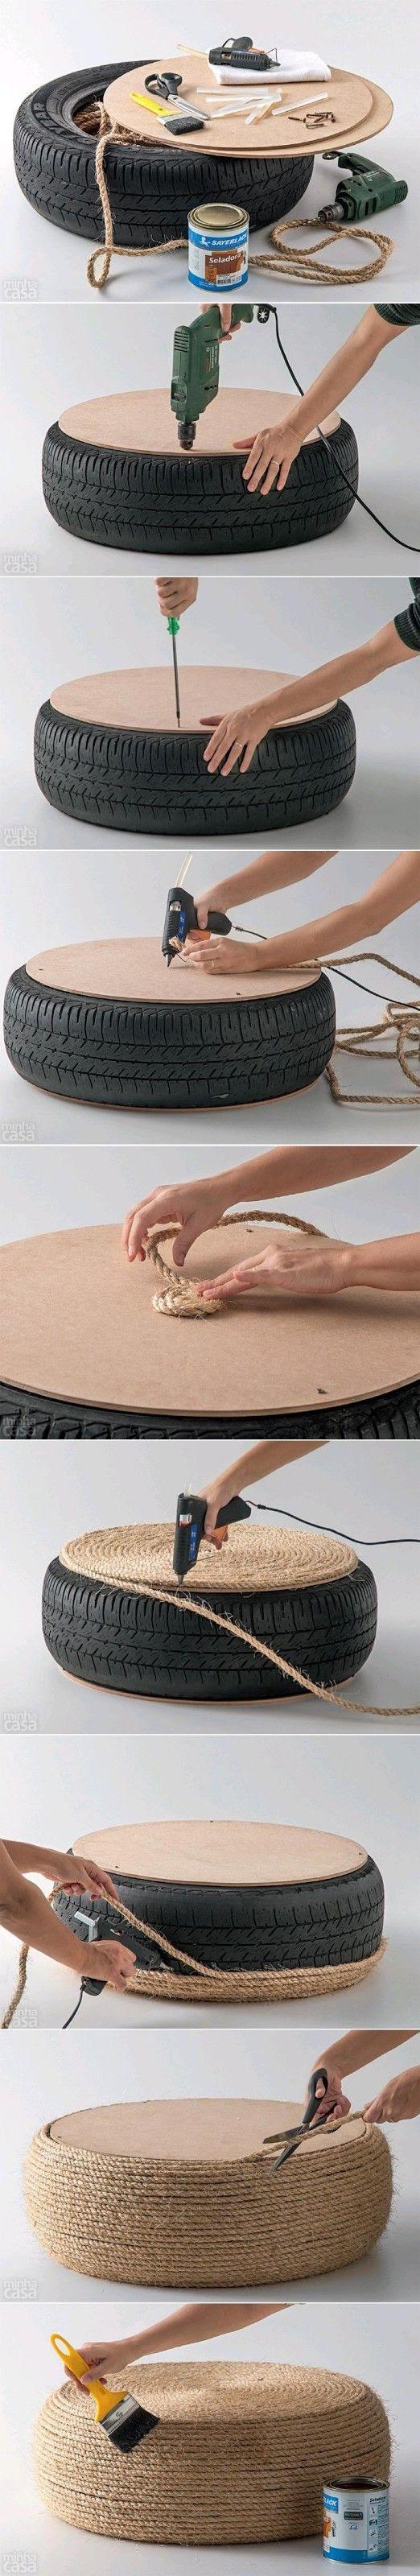 DIY Tire Ottoman..I would add some legs